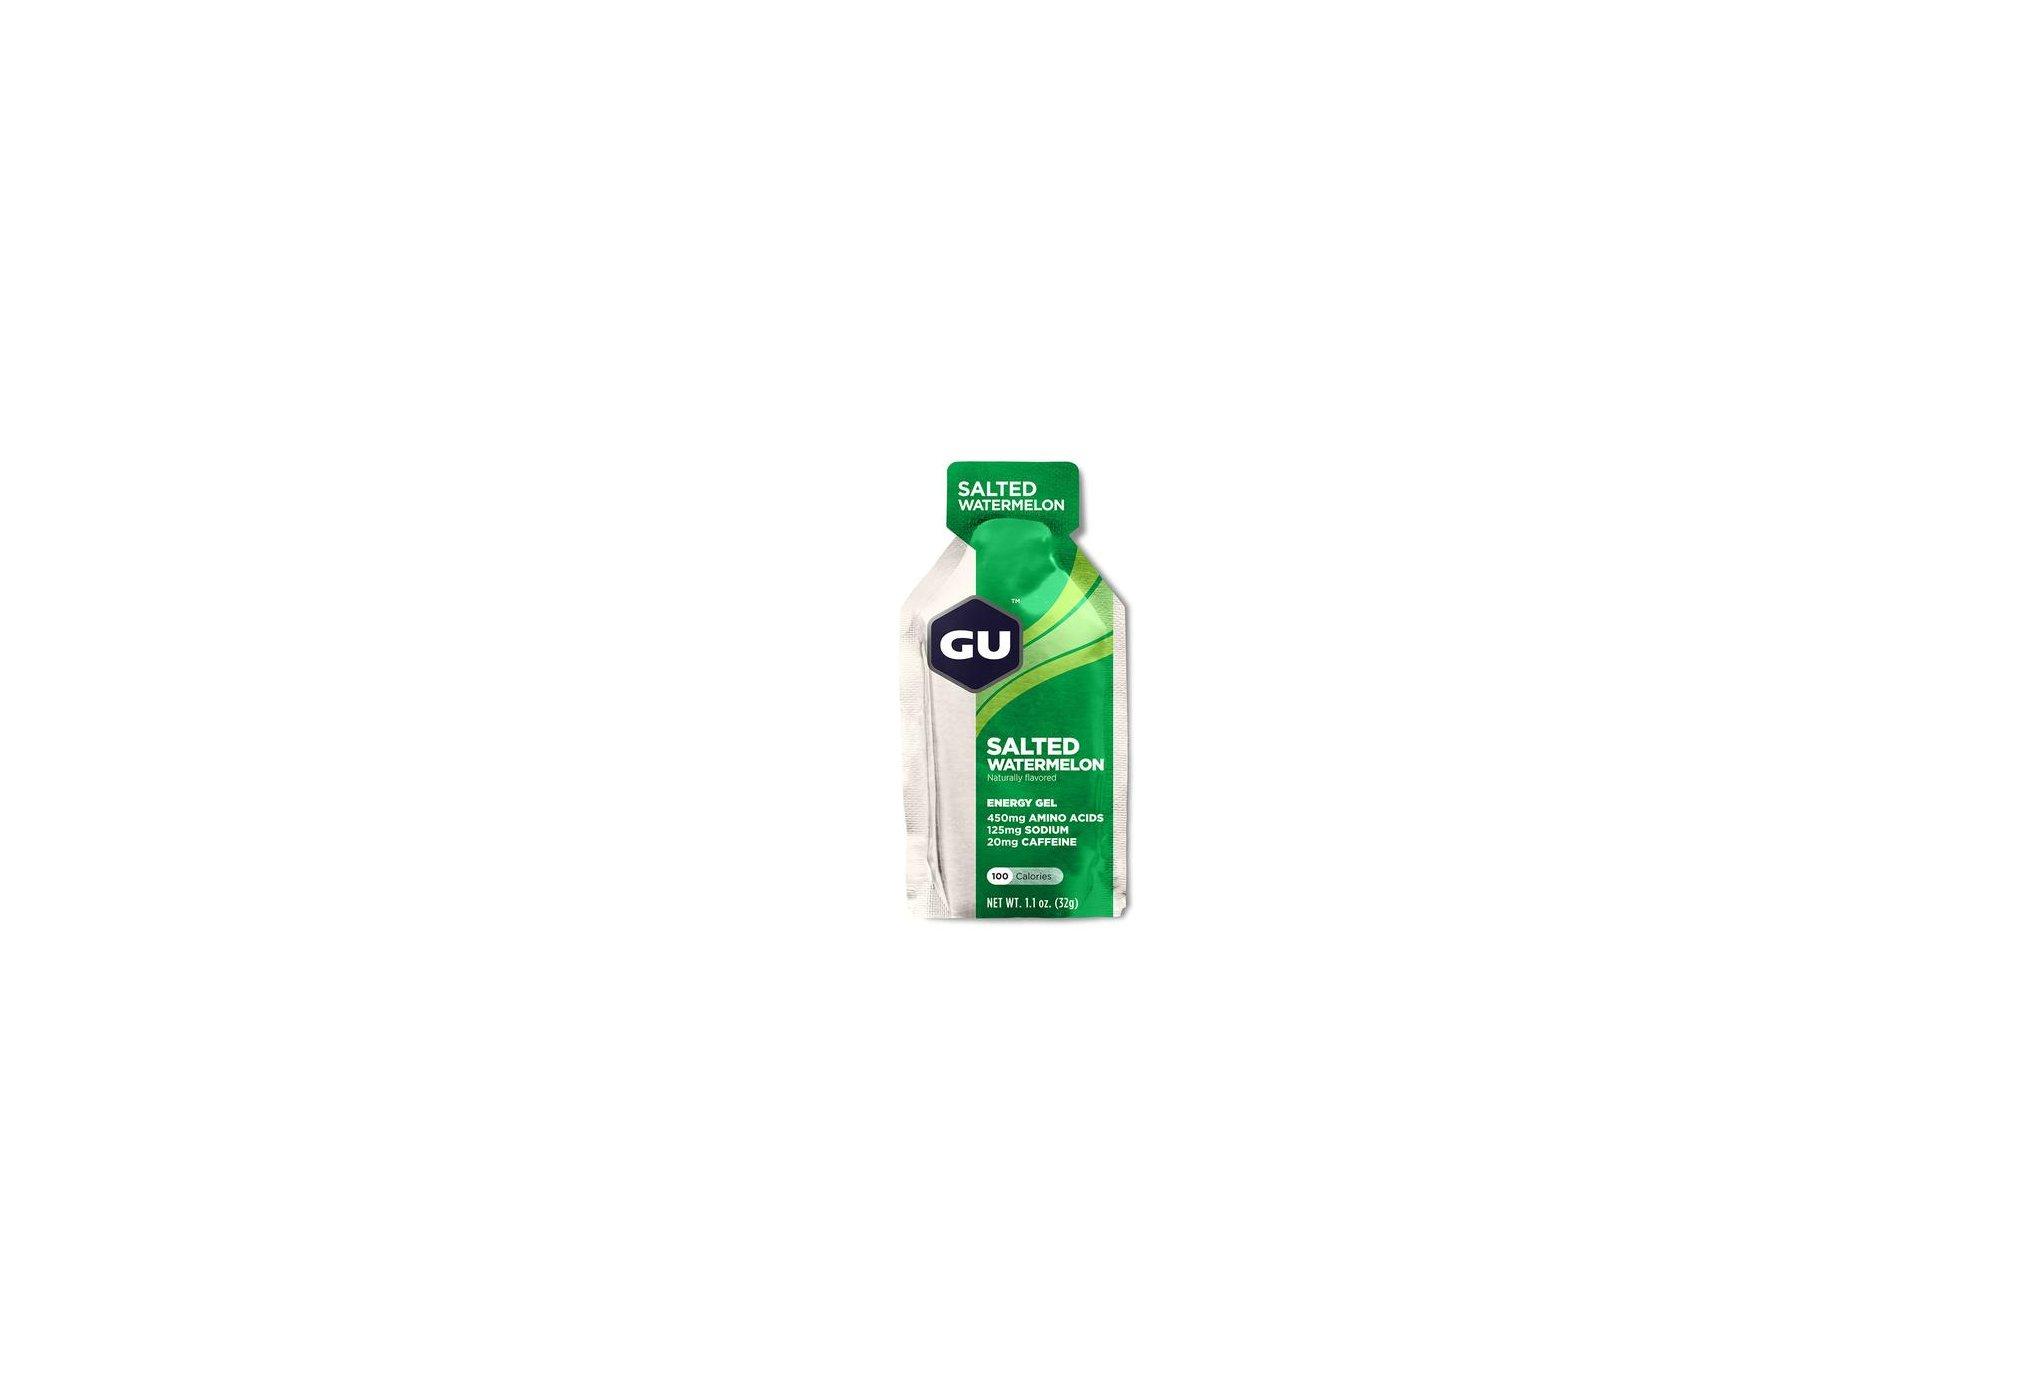 GU Gel Energy - Salted Watermelon Diététique Gels